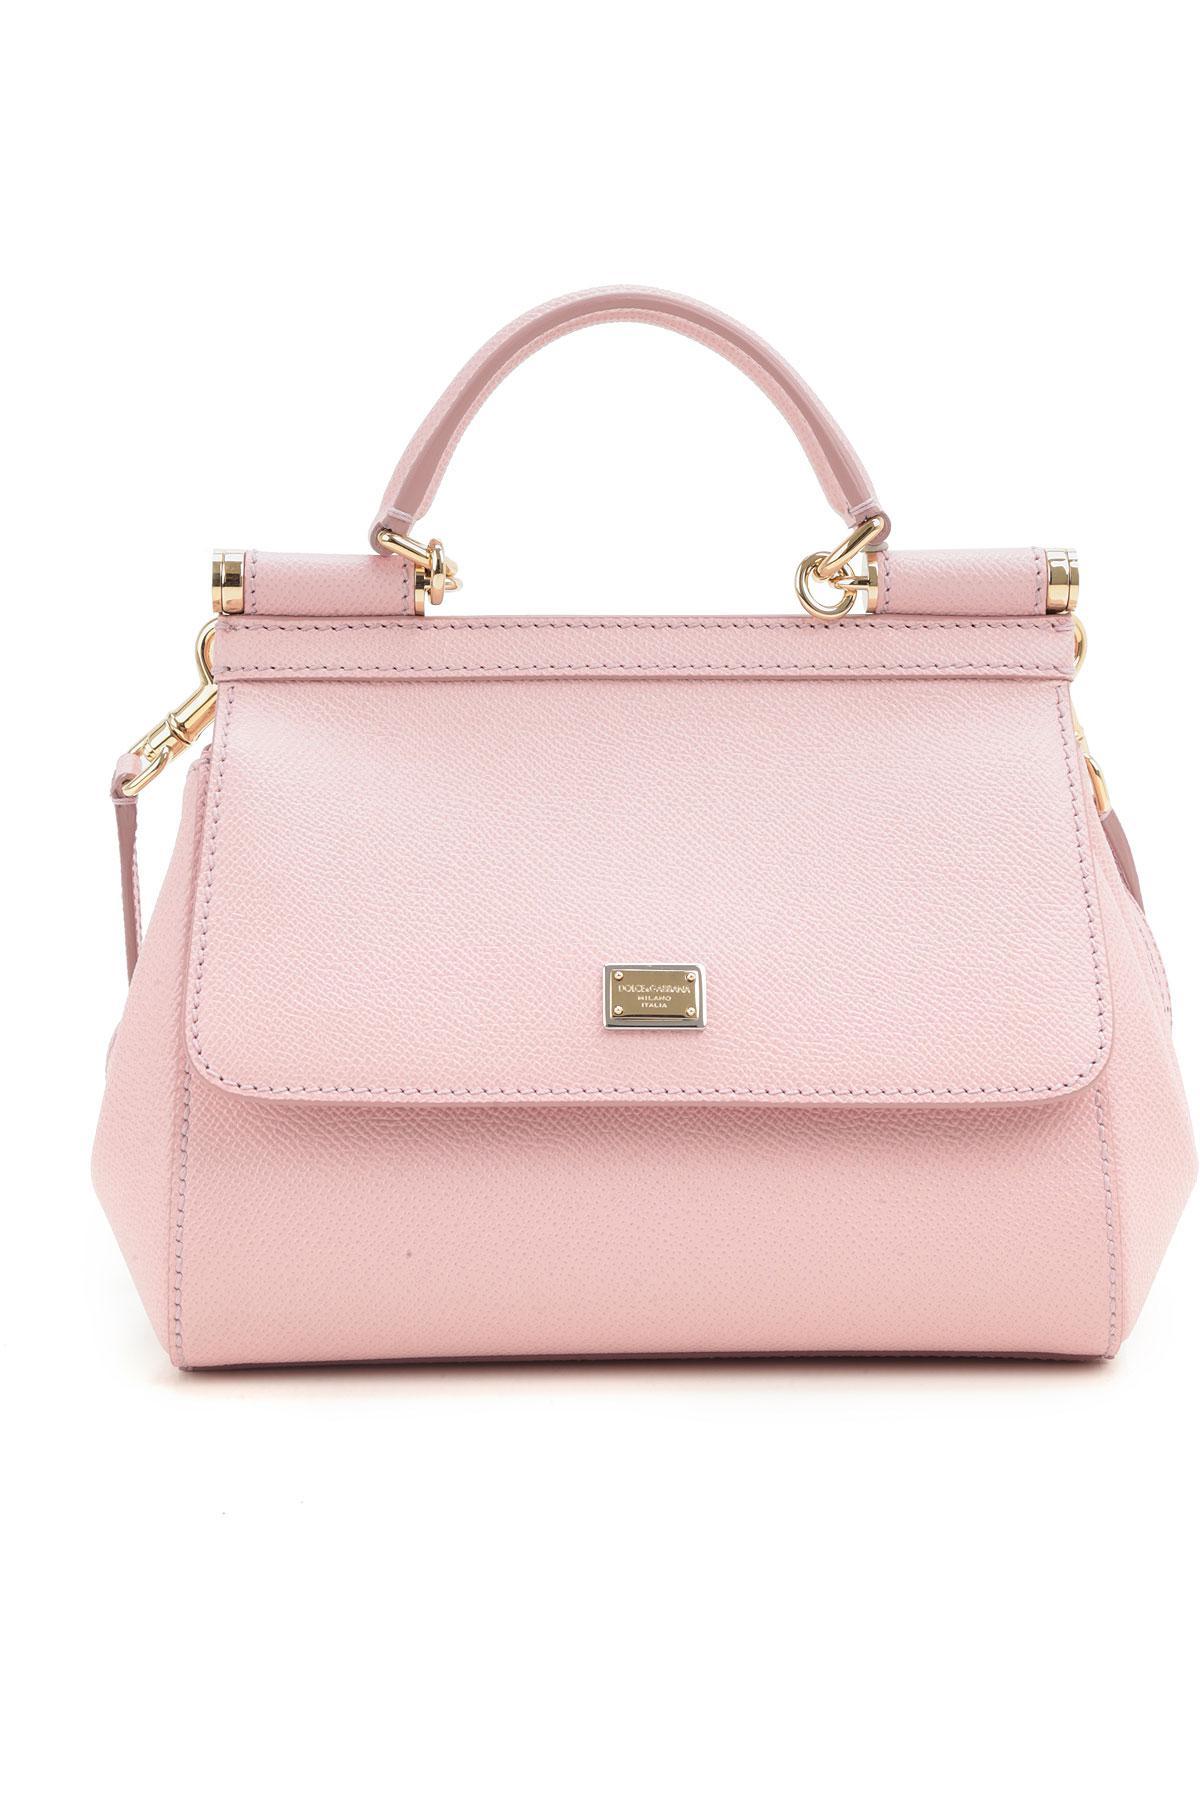 9bcd5936f4 Dolce   Gabbana Handbags in Pink - Lyst